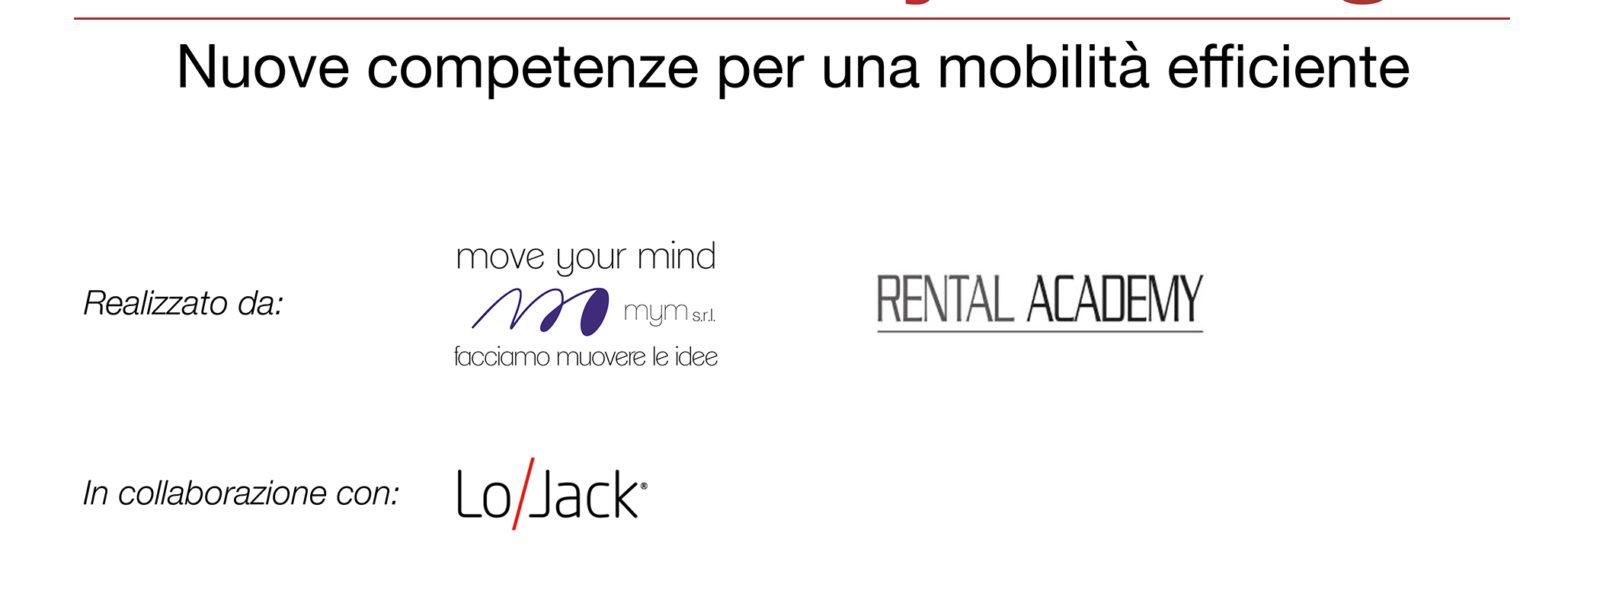 Fleet & Mobility Management - Aiaga